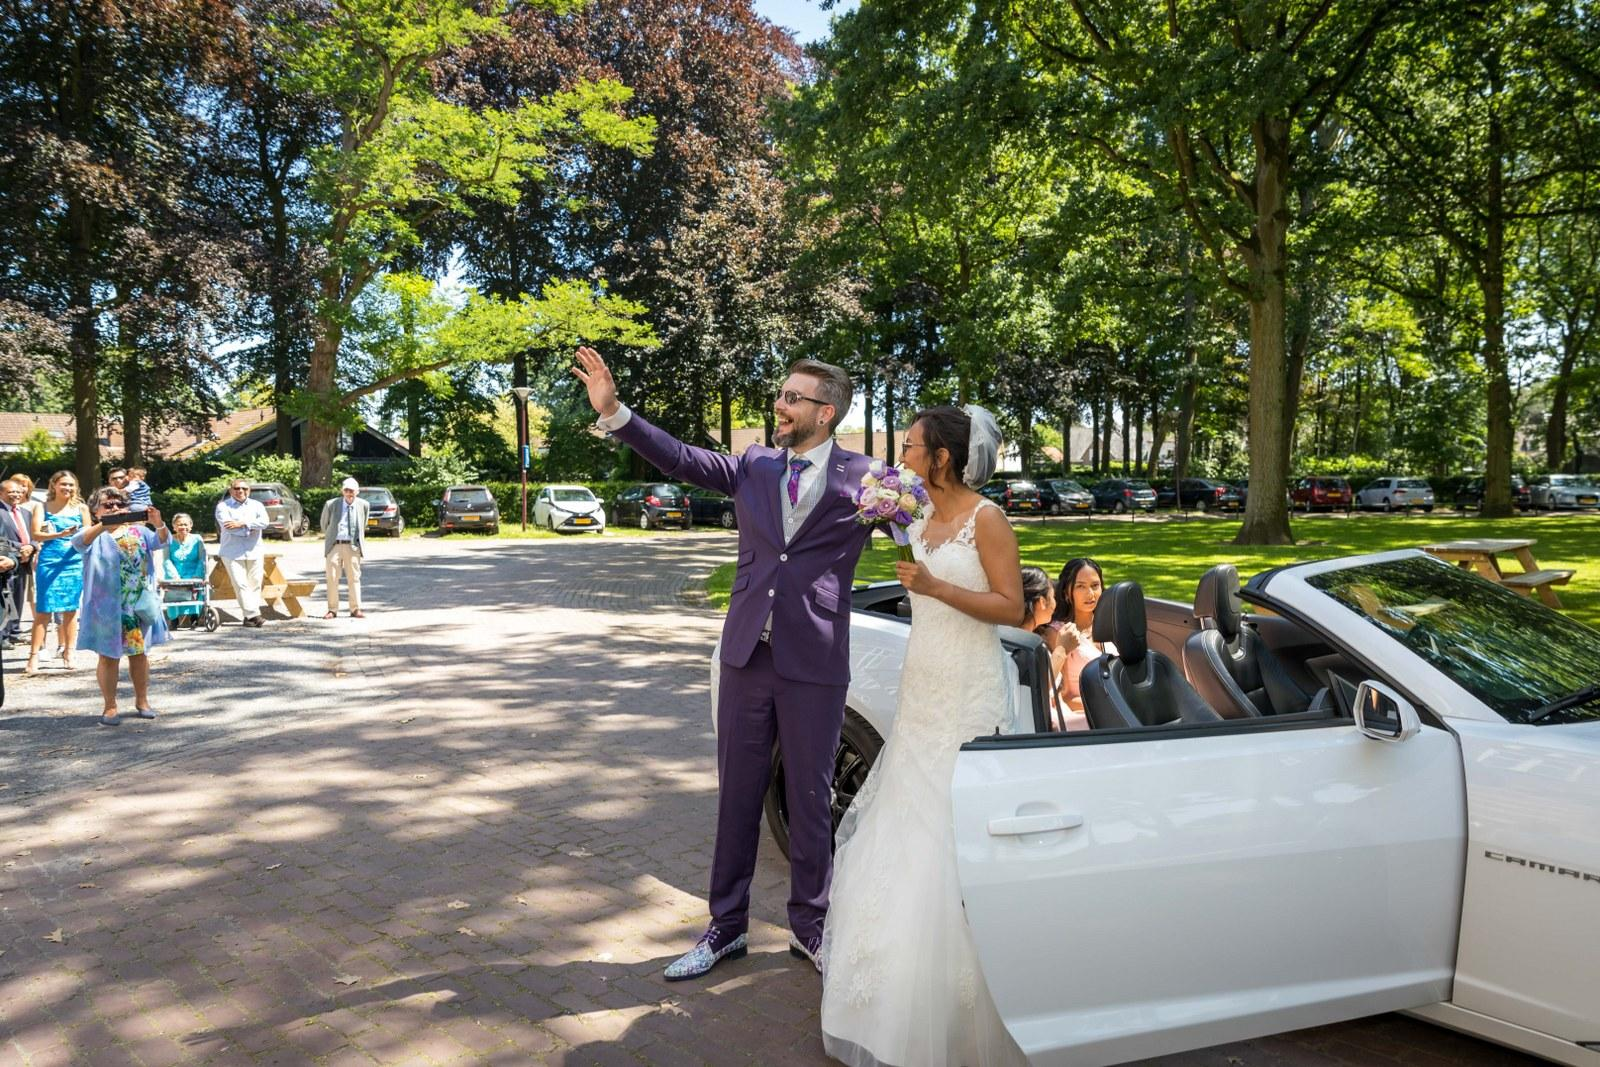 Paars trouwpak met geruite gilet en mooie details